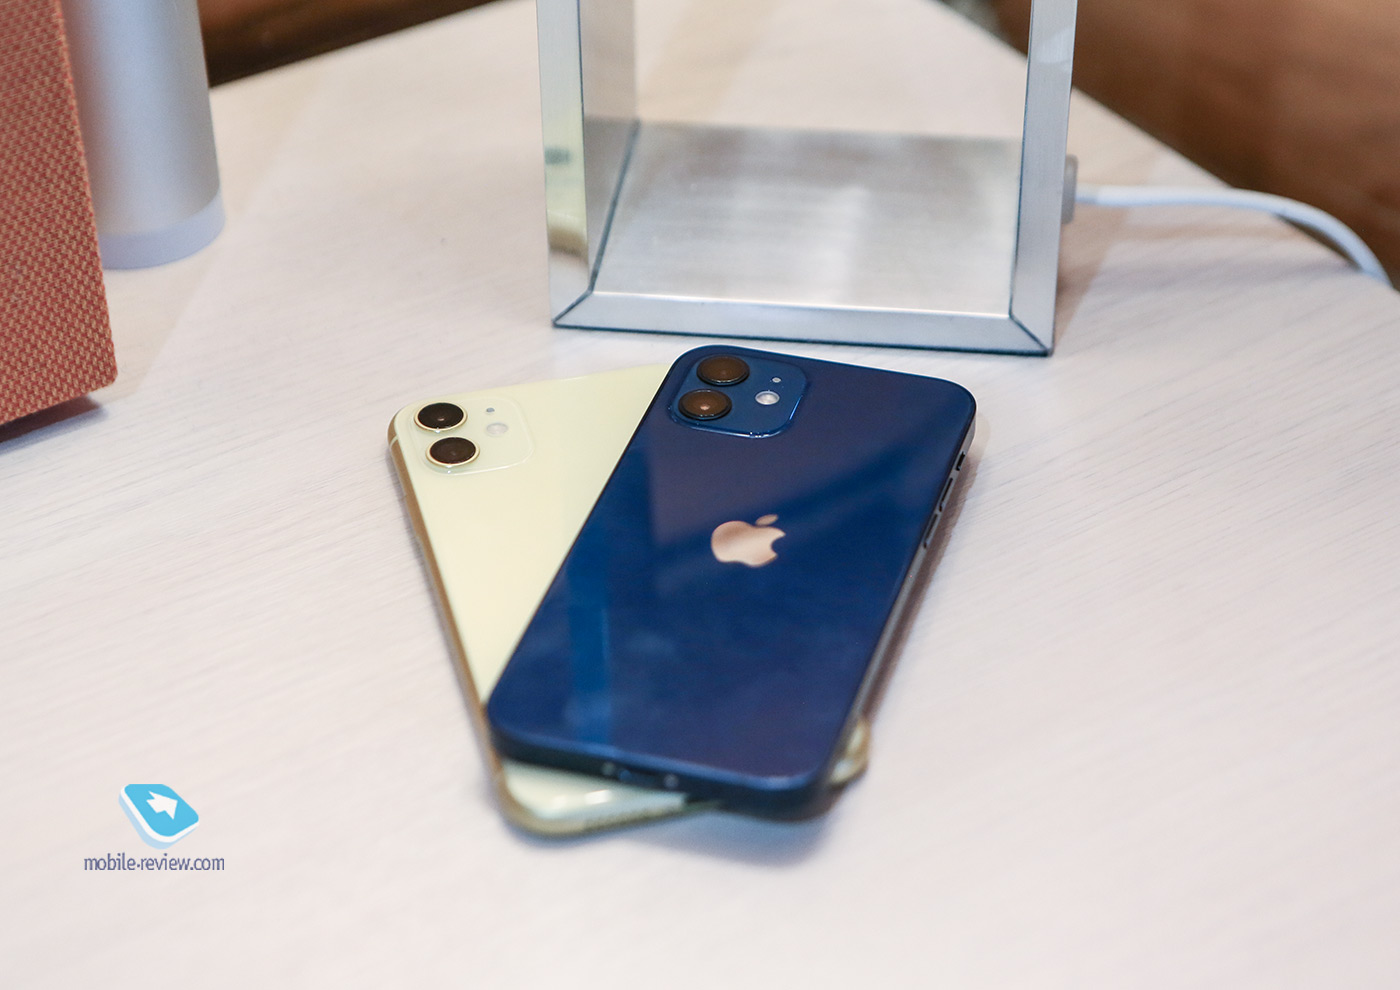 Руководство по покупке iPhone 11 и iPhone 12: почему старый iPhone лучше